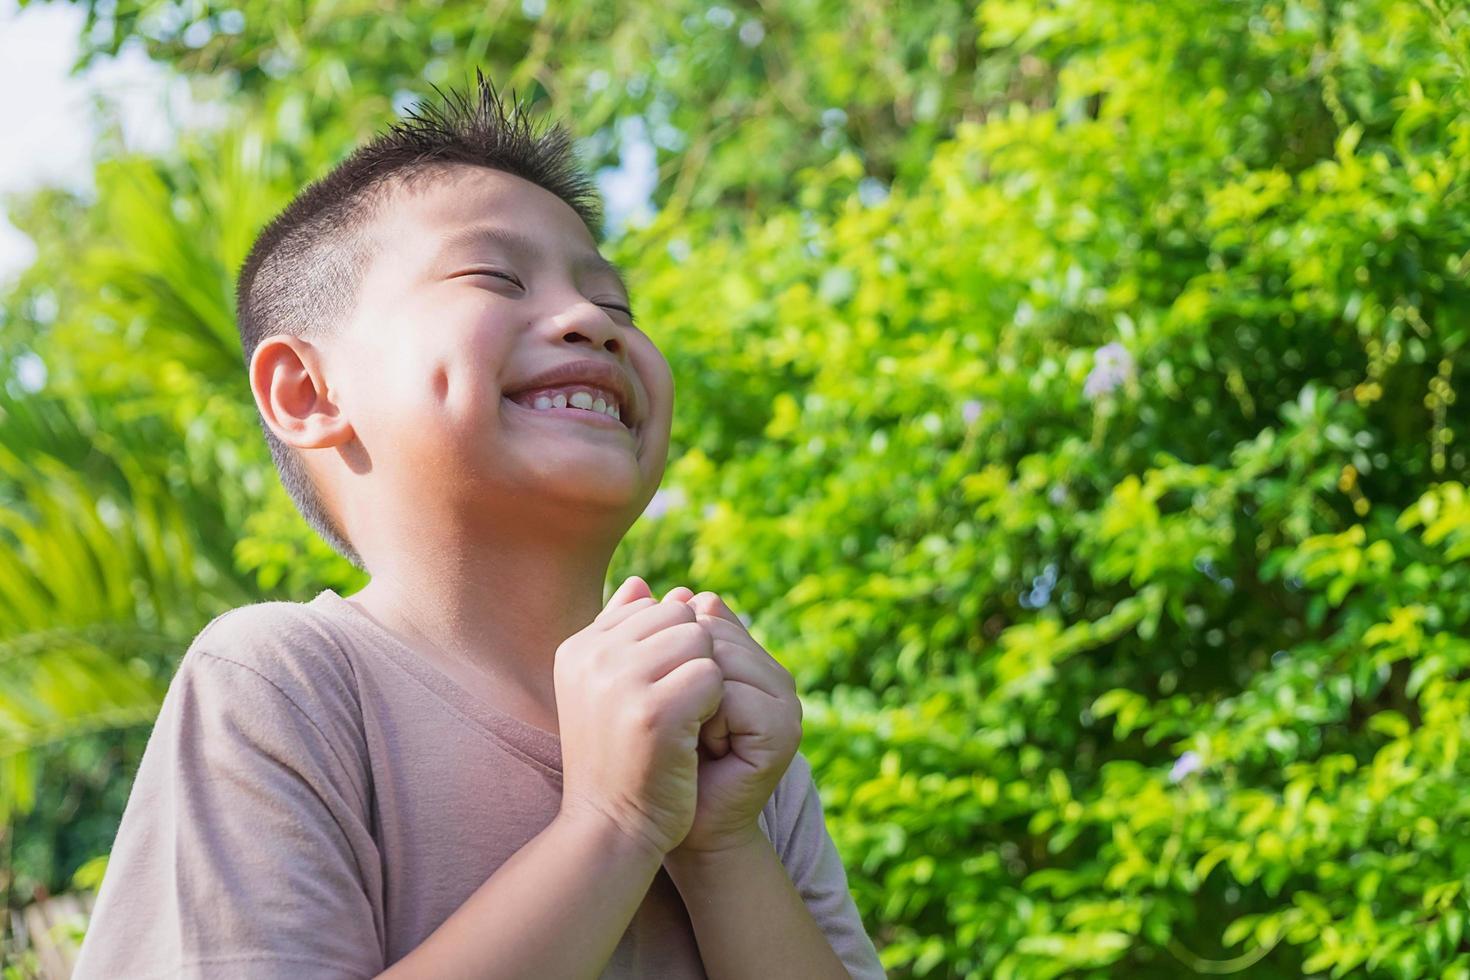 Boy smiling outside photo